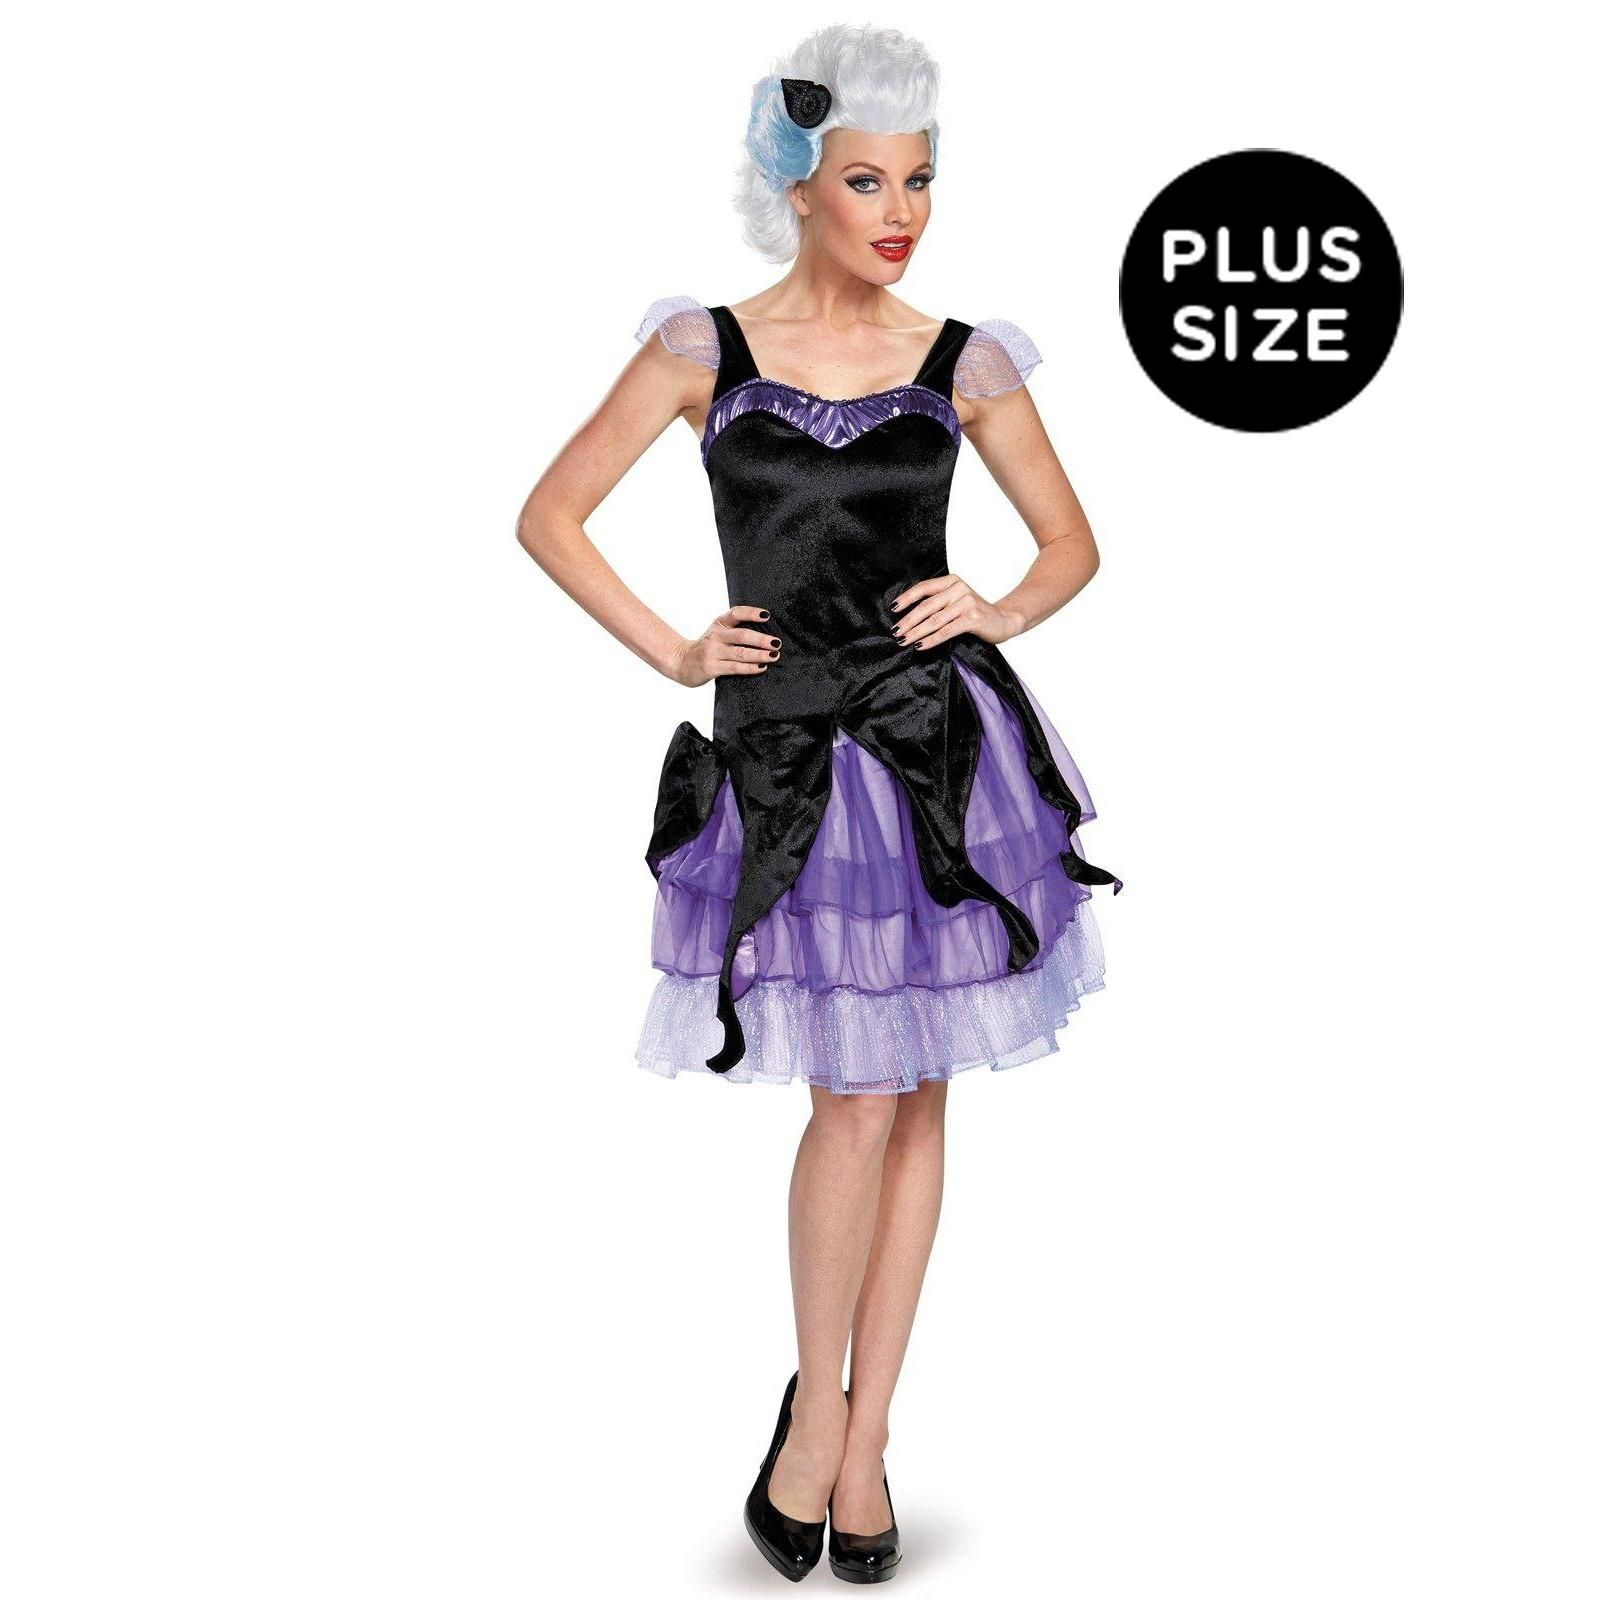 disney deluxe ursula plus size costume for women | costumes